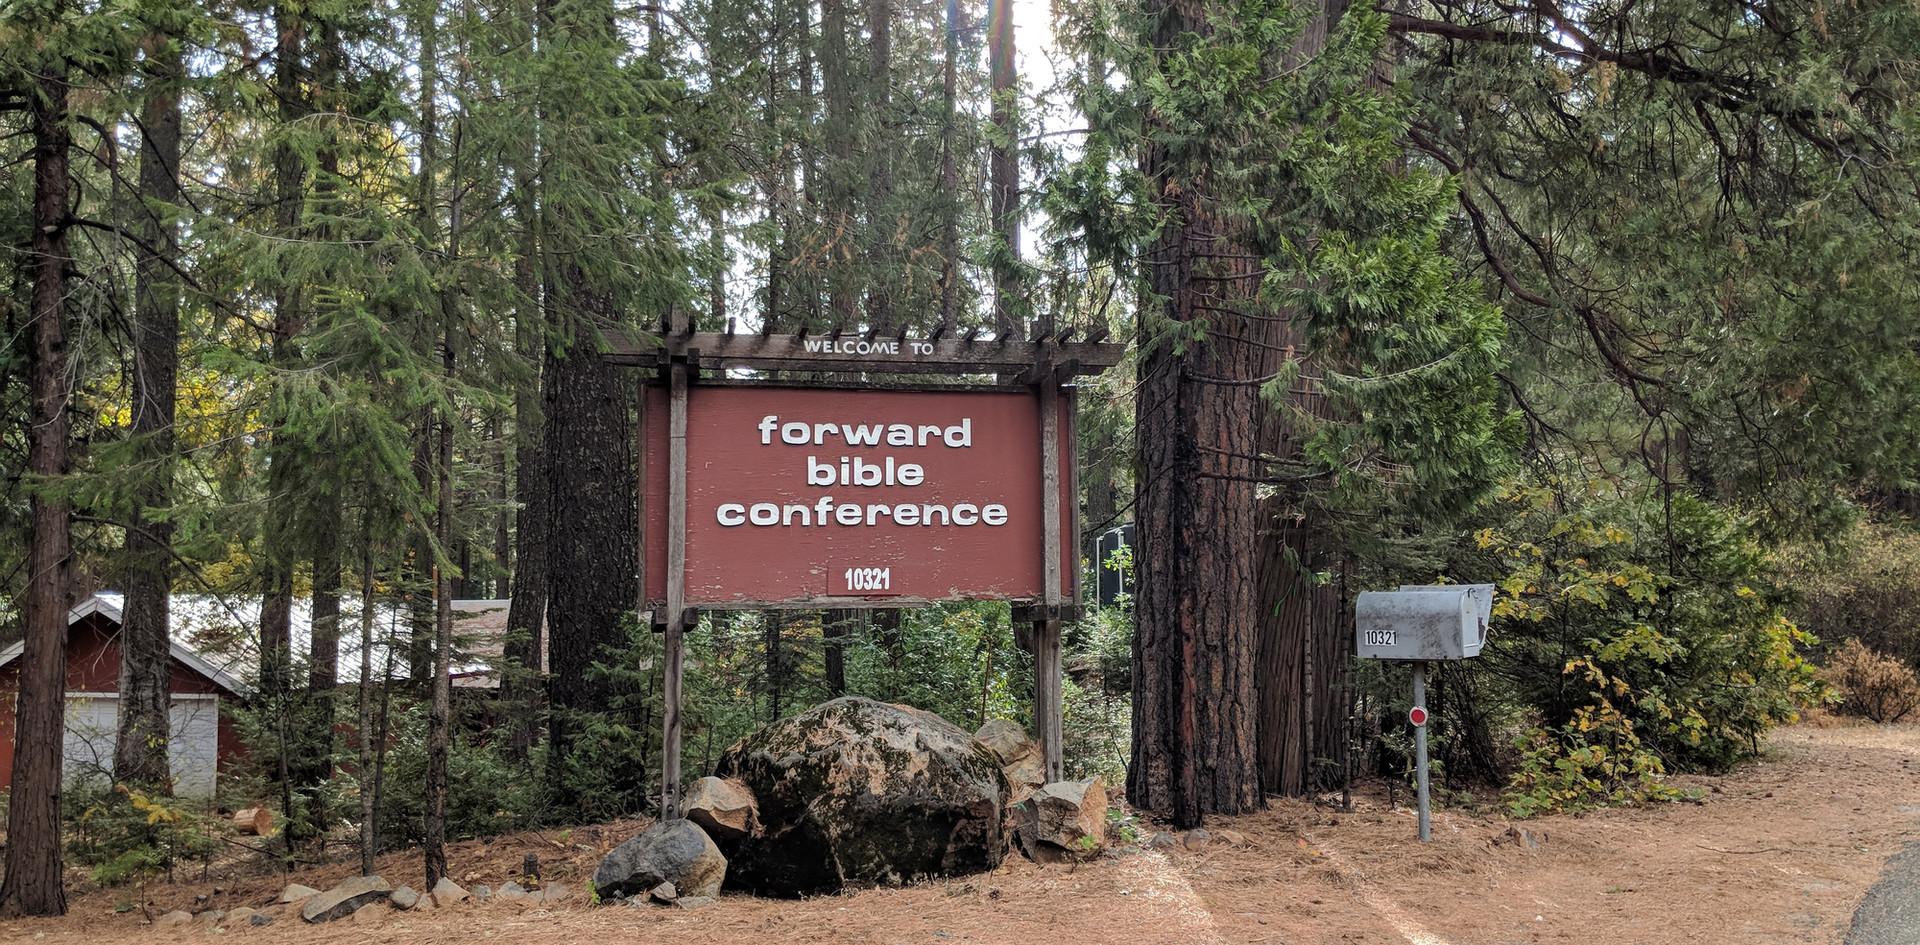 Camp Entrance